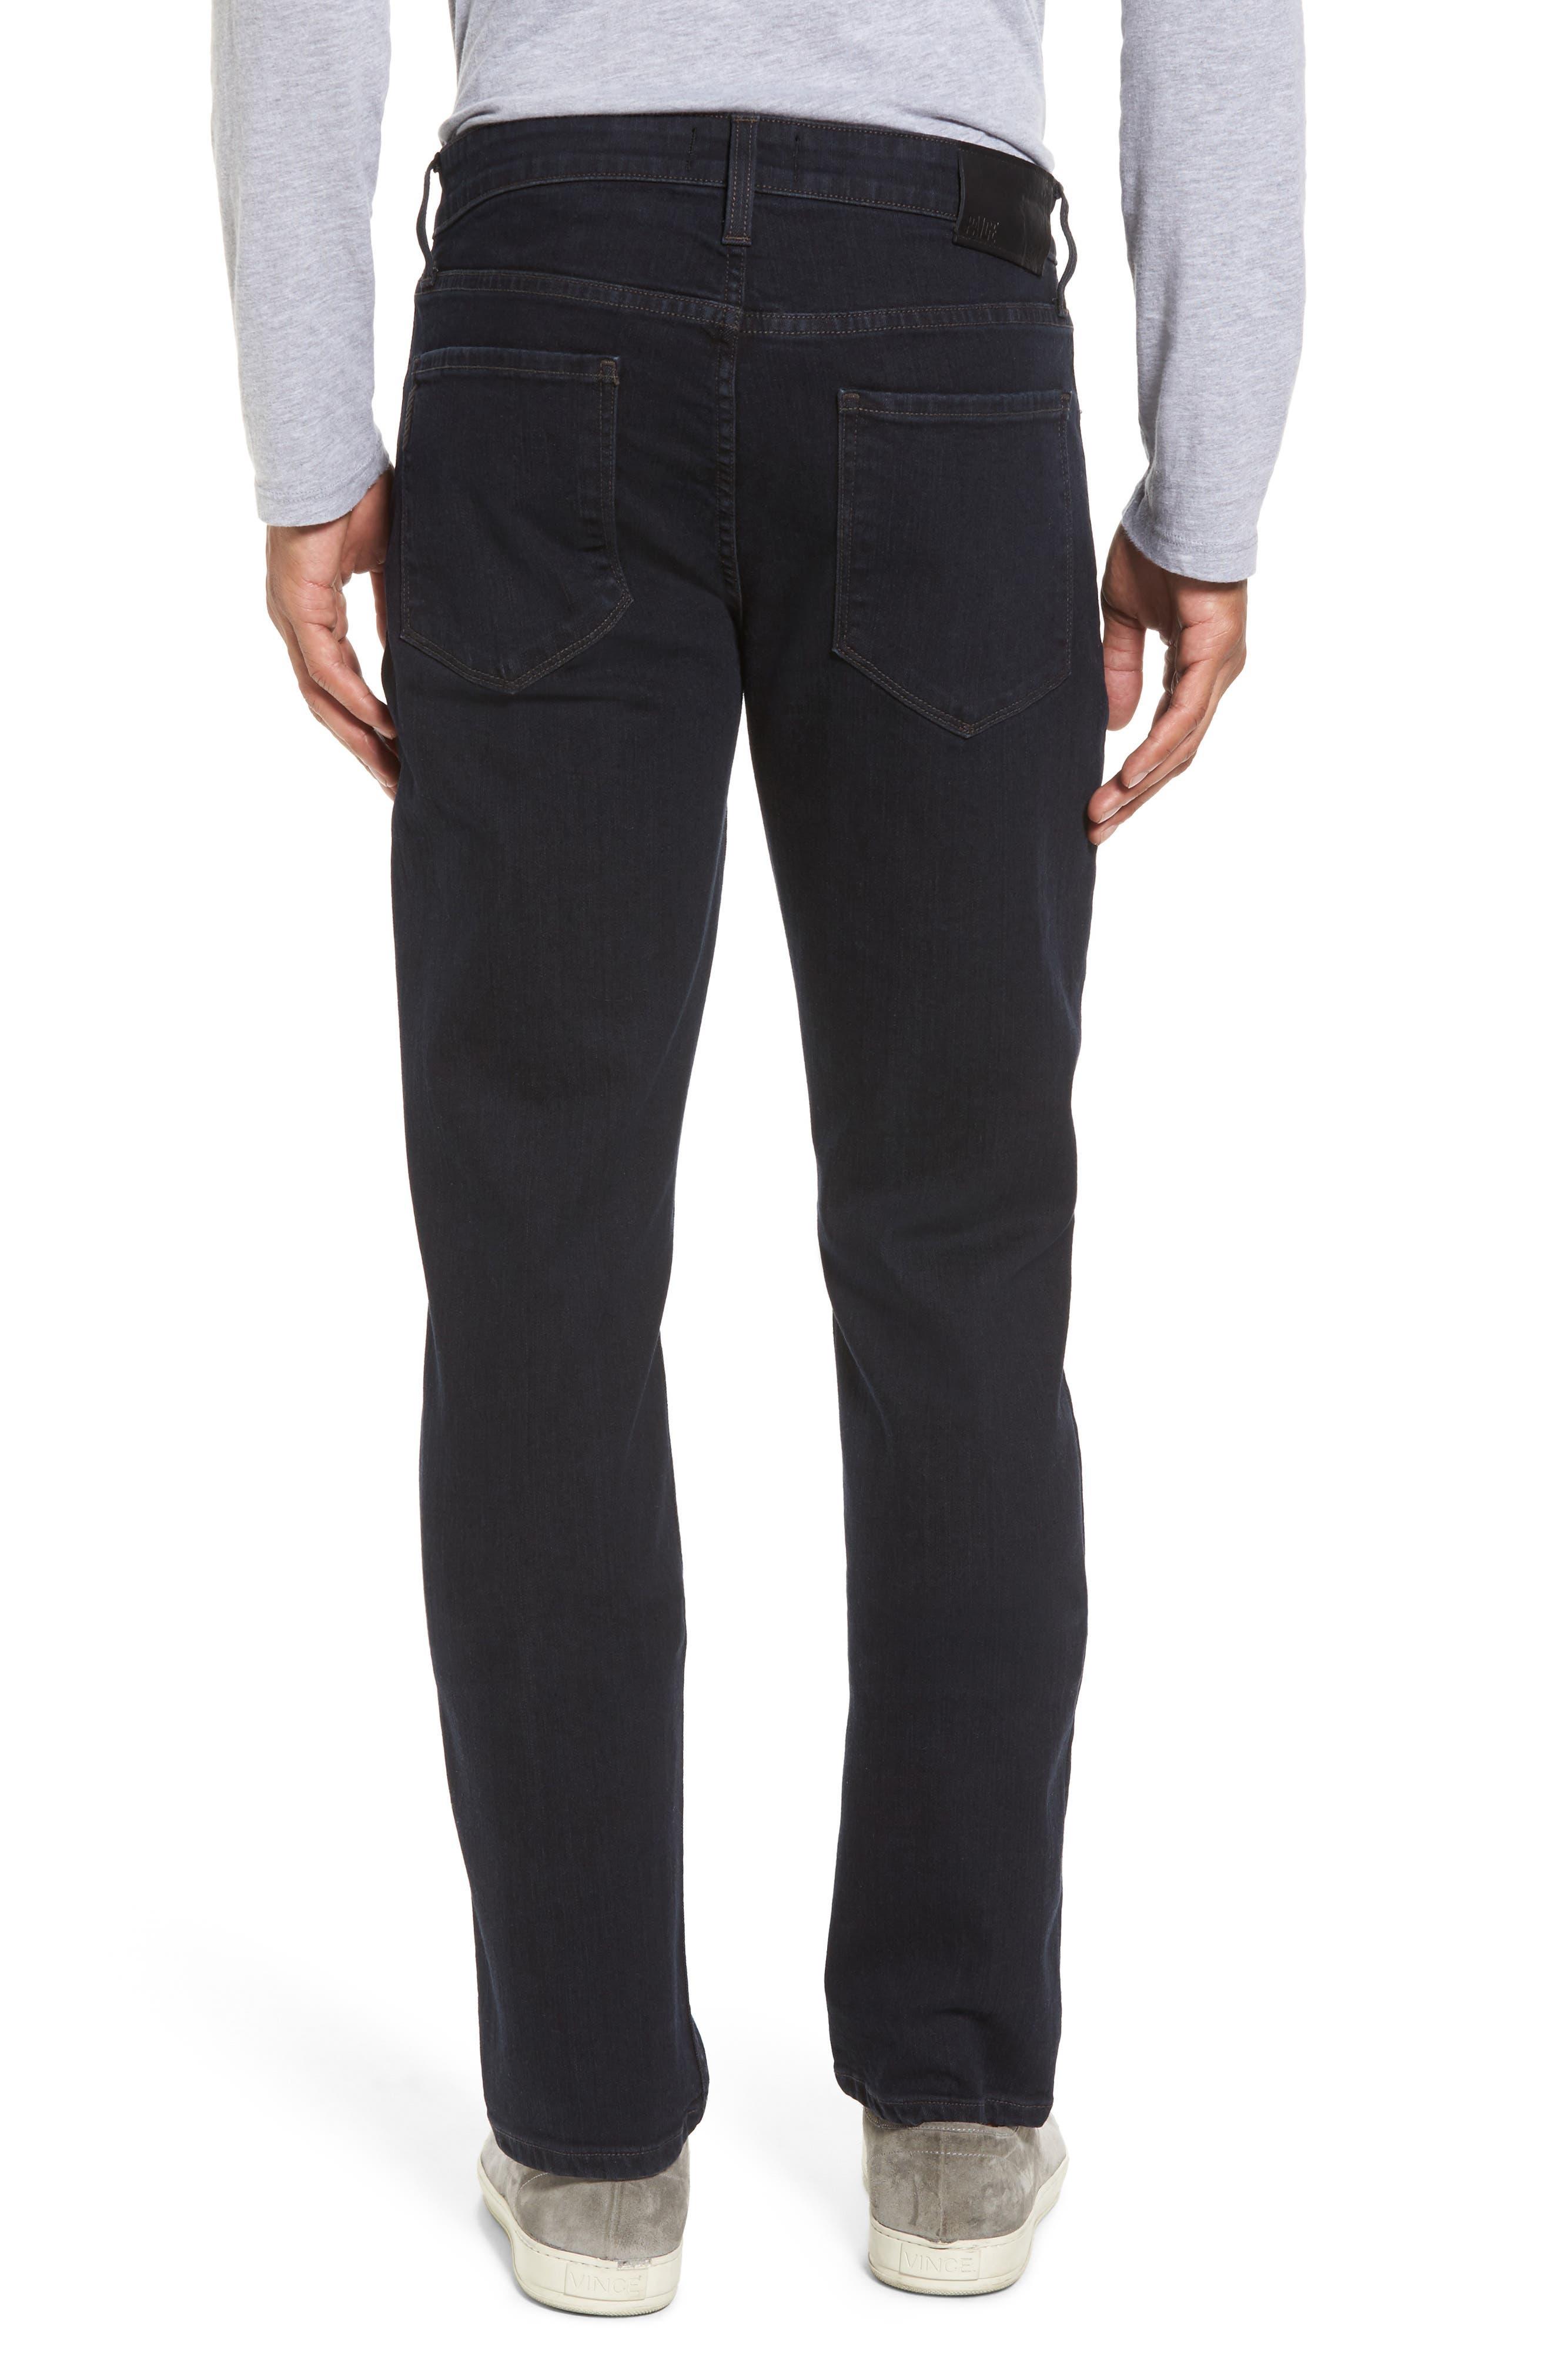 Lennox Slim Fit Jeans,                             Alternate thumbnail 2, color,                             TOMMY